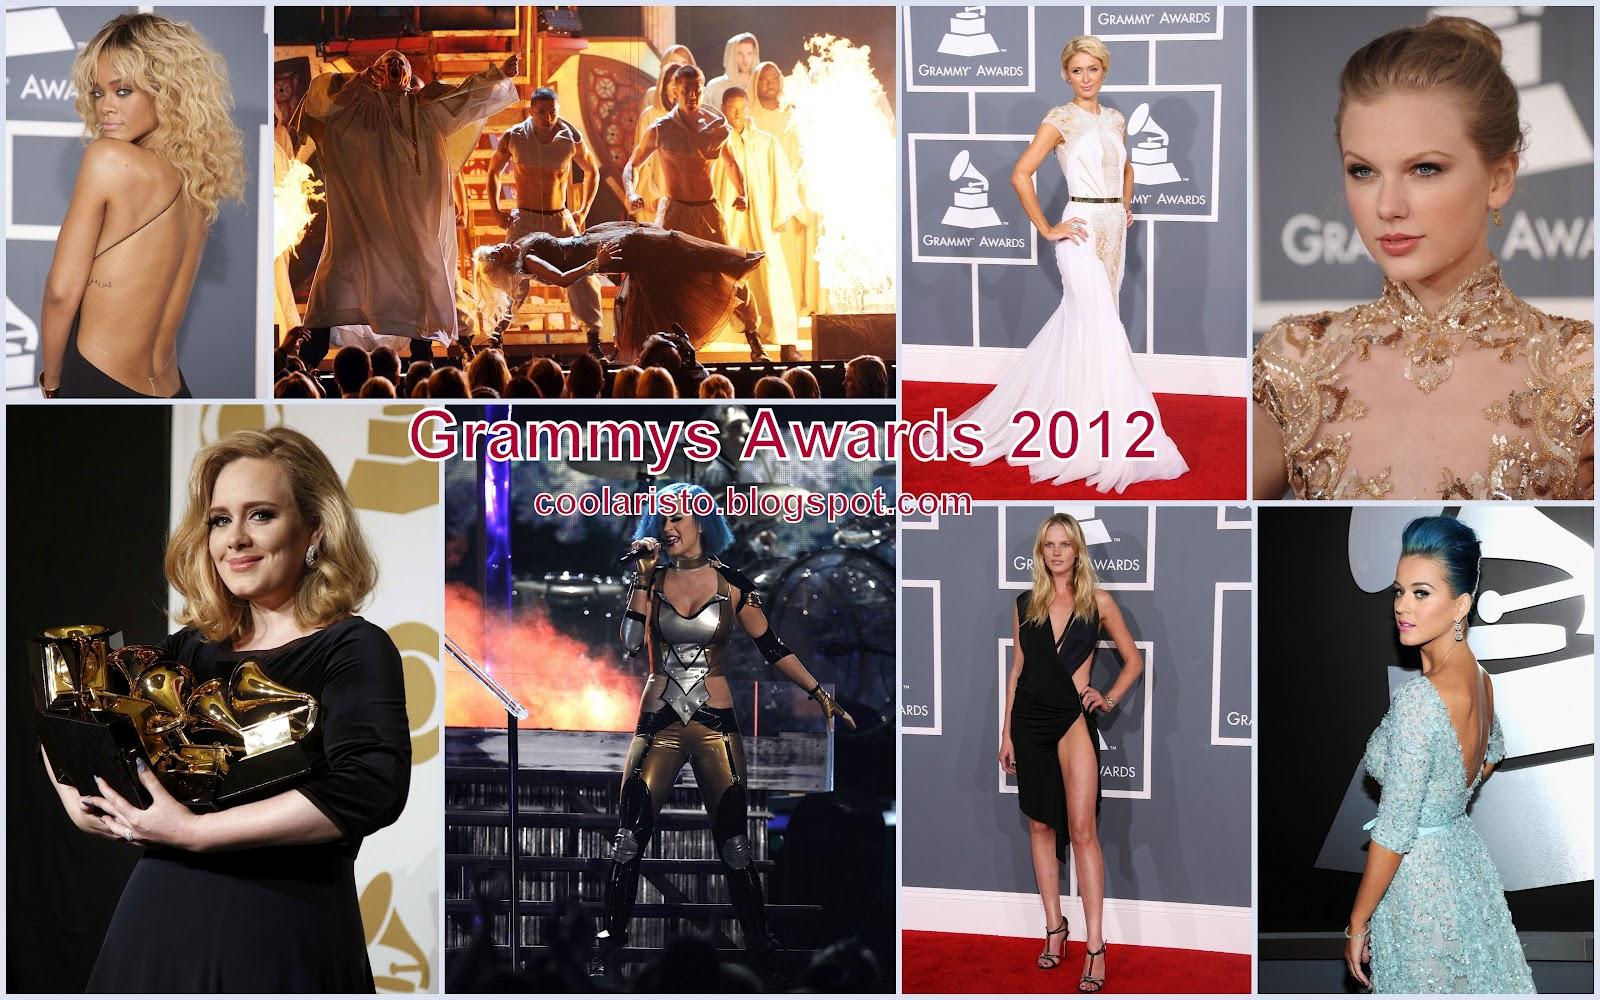 http://1.bp.blogspot.com/-PxJykkTgF74/Tzk-BWabefI/AAAAAAAALSc/m1kspr8n8bM/s1600/grammys+awards+2012+rihanna+adele+minaj+perry+anne+v+hilton+coolaristo.jpg